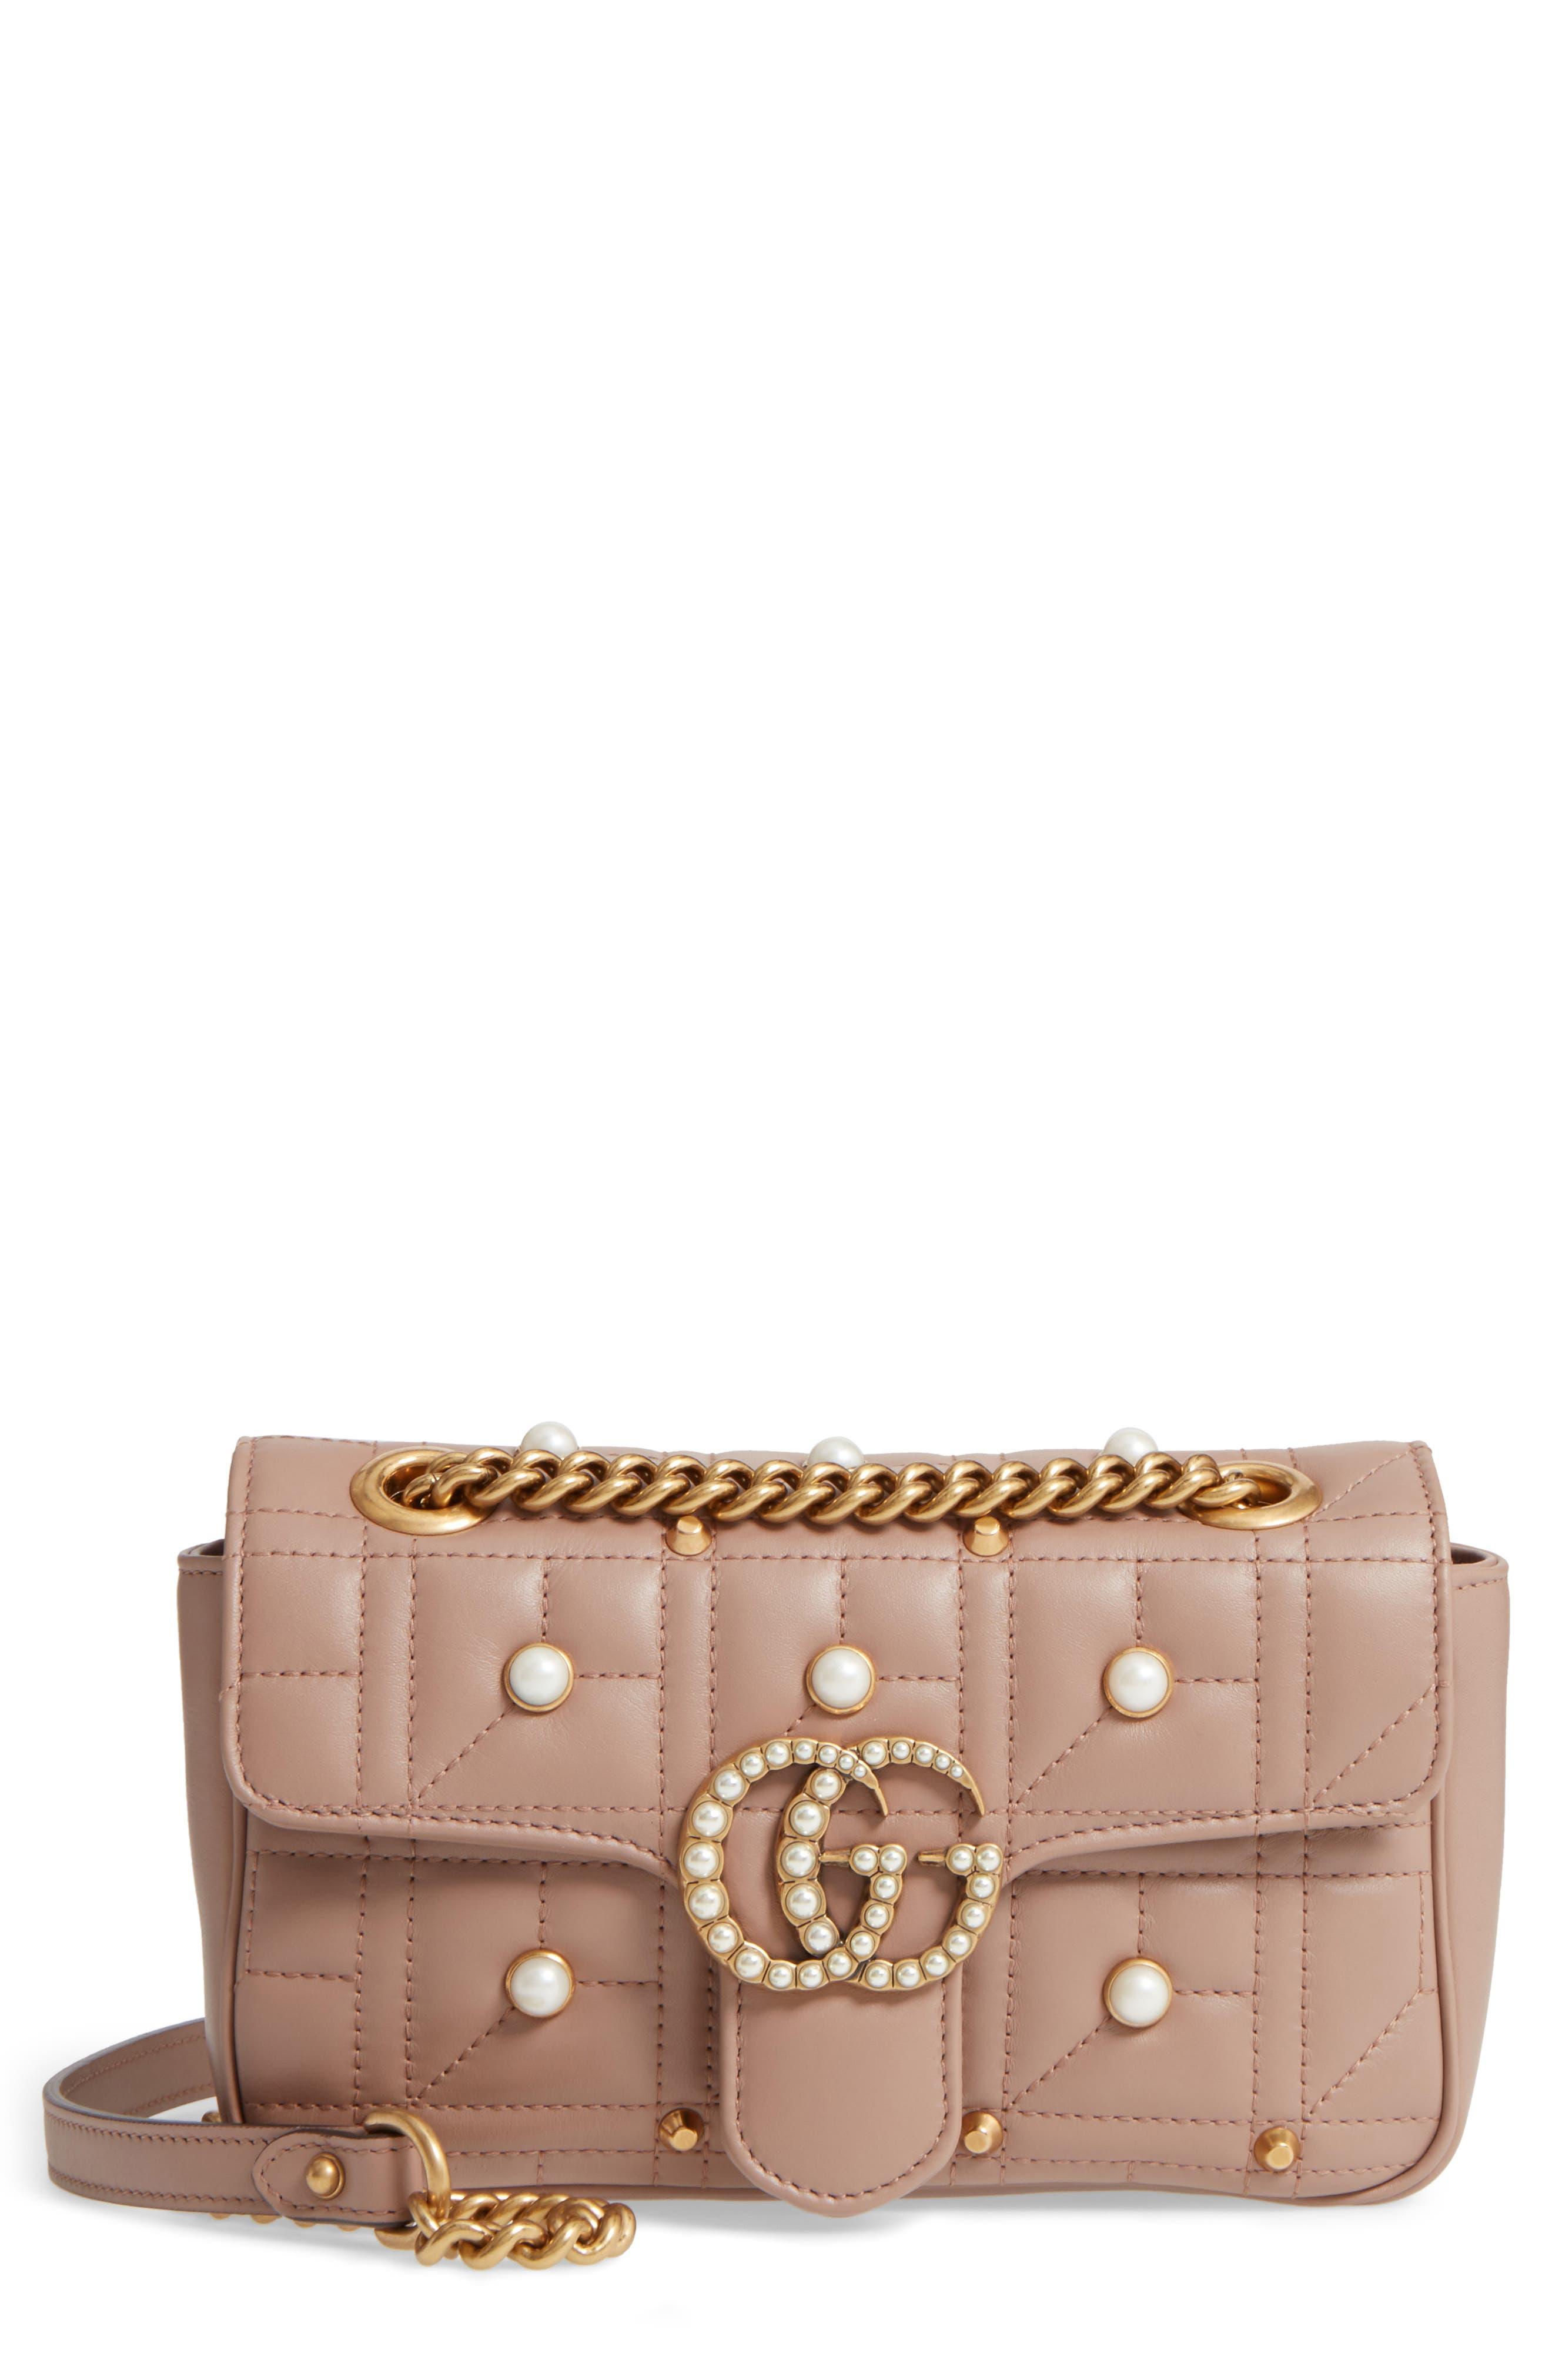 Gucci Mini GG Marmont 2.0 Imitation Pearl Logo Matelassé Leather Shoulder Bag